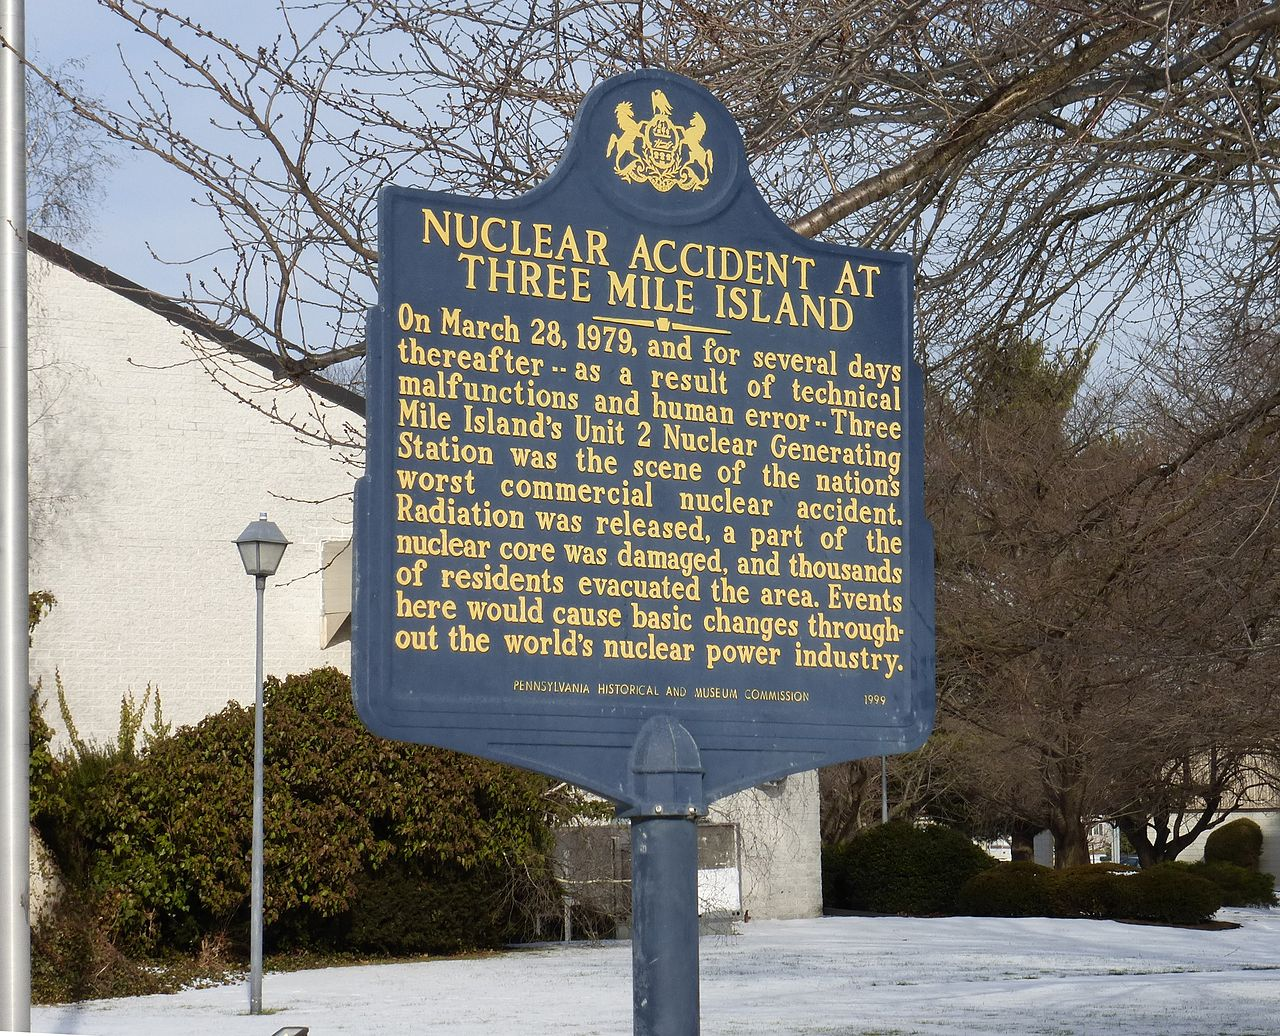 Three_Mile_Island_accident_sign.jpg